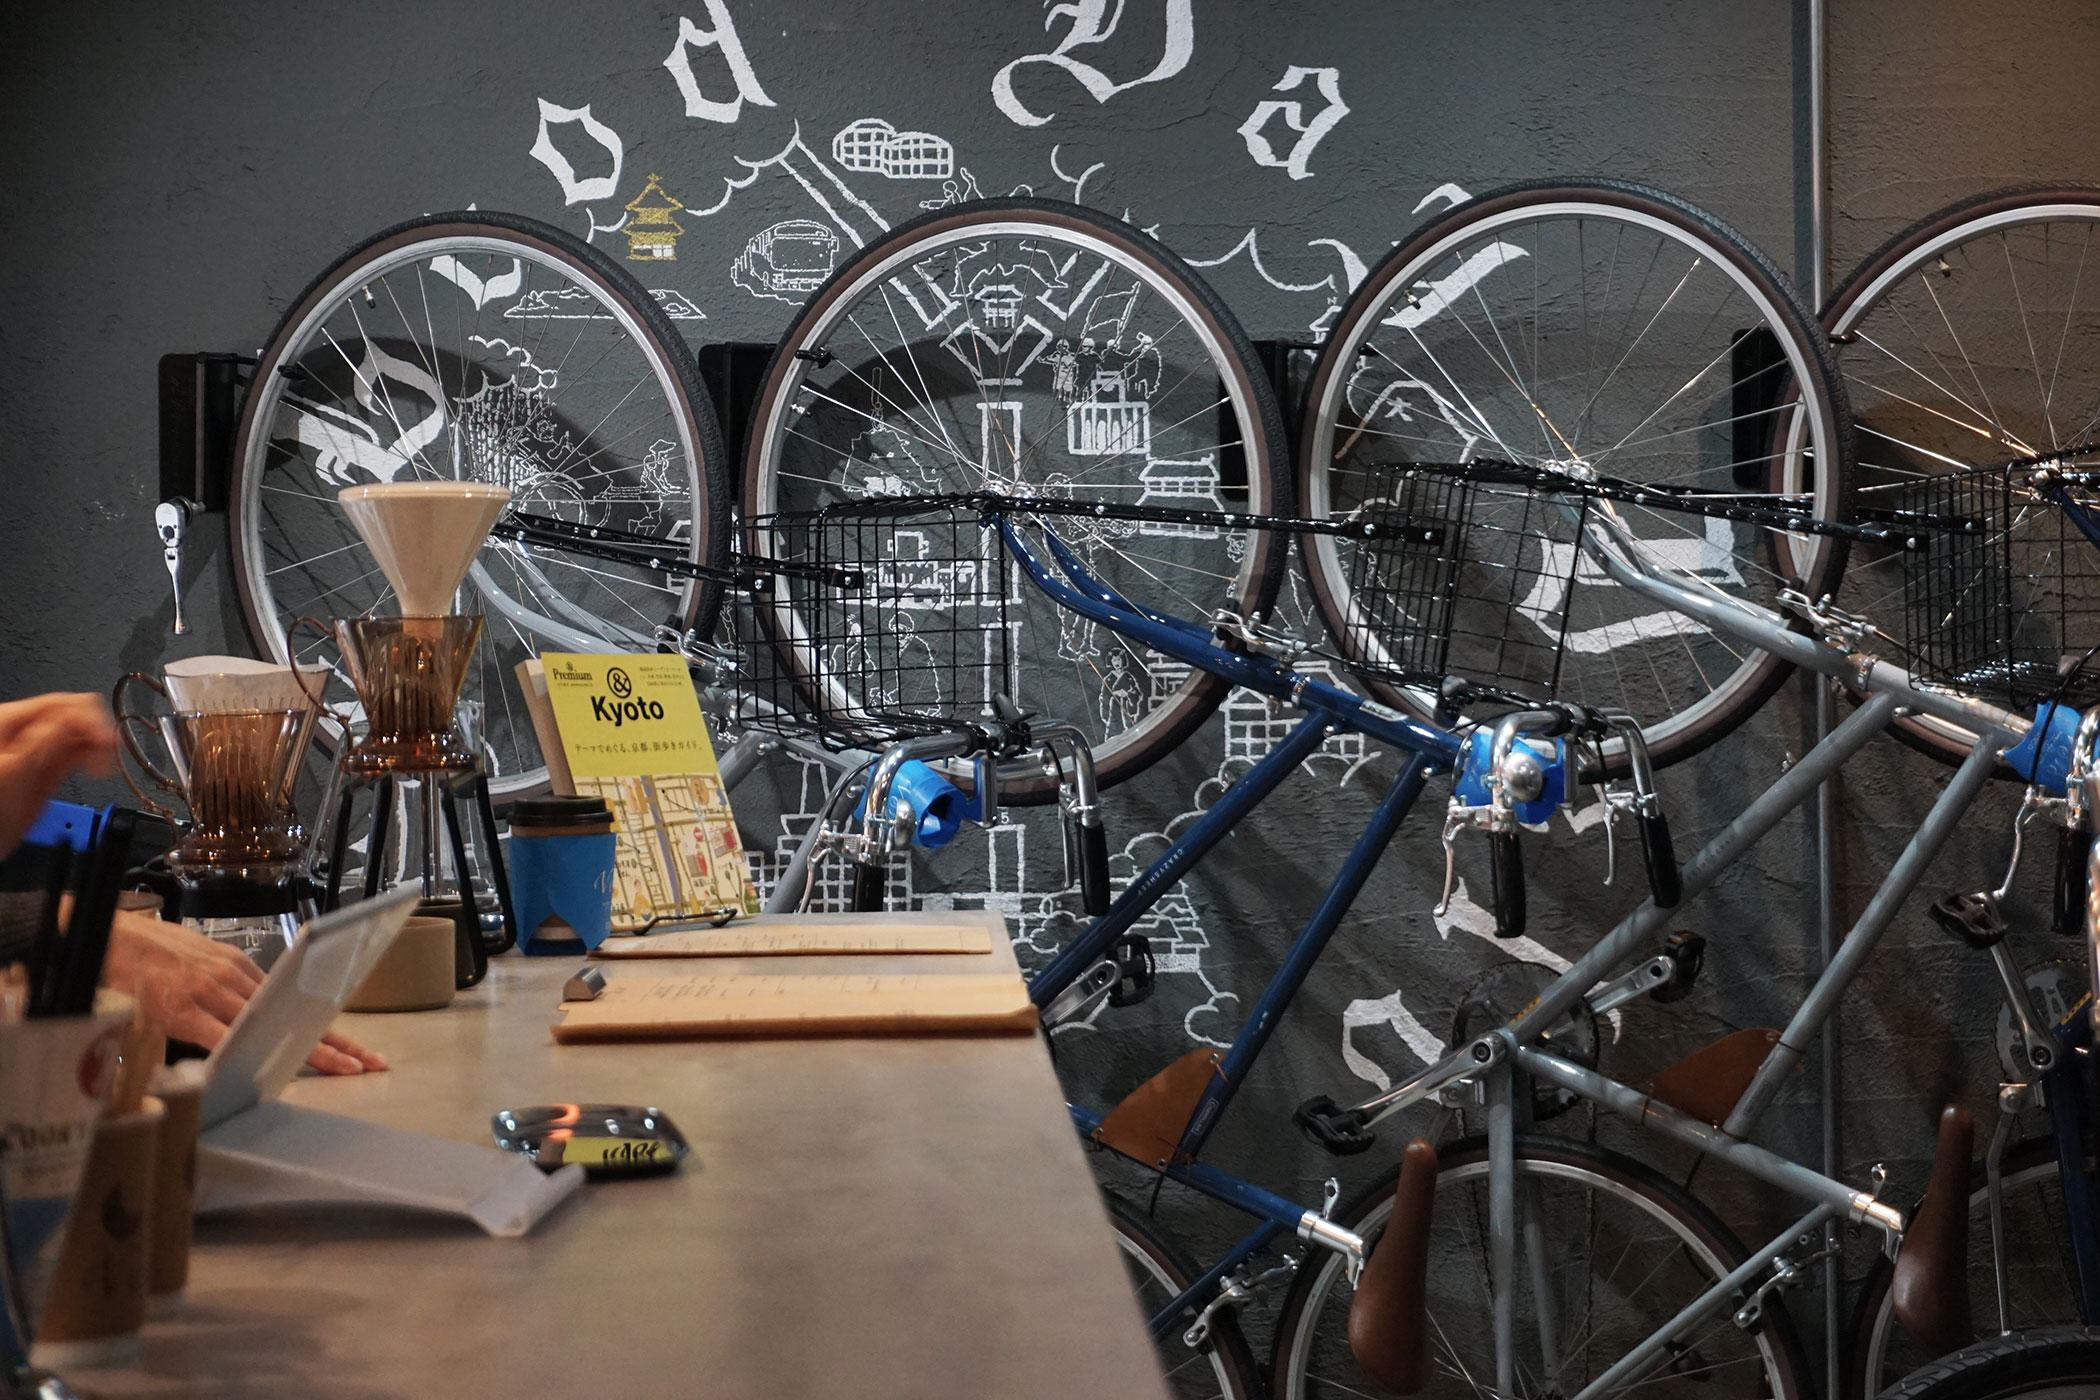 THE GOOD DAY VELO BIKE & COFFEE KYOTO 京都といえば自転車!スペシャルティコーヒーが味わえるレンタサイクルショップ